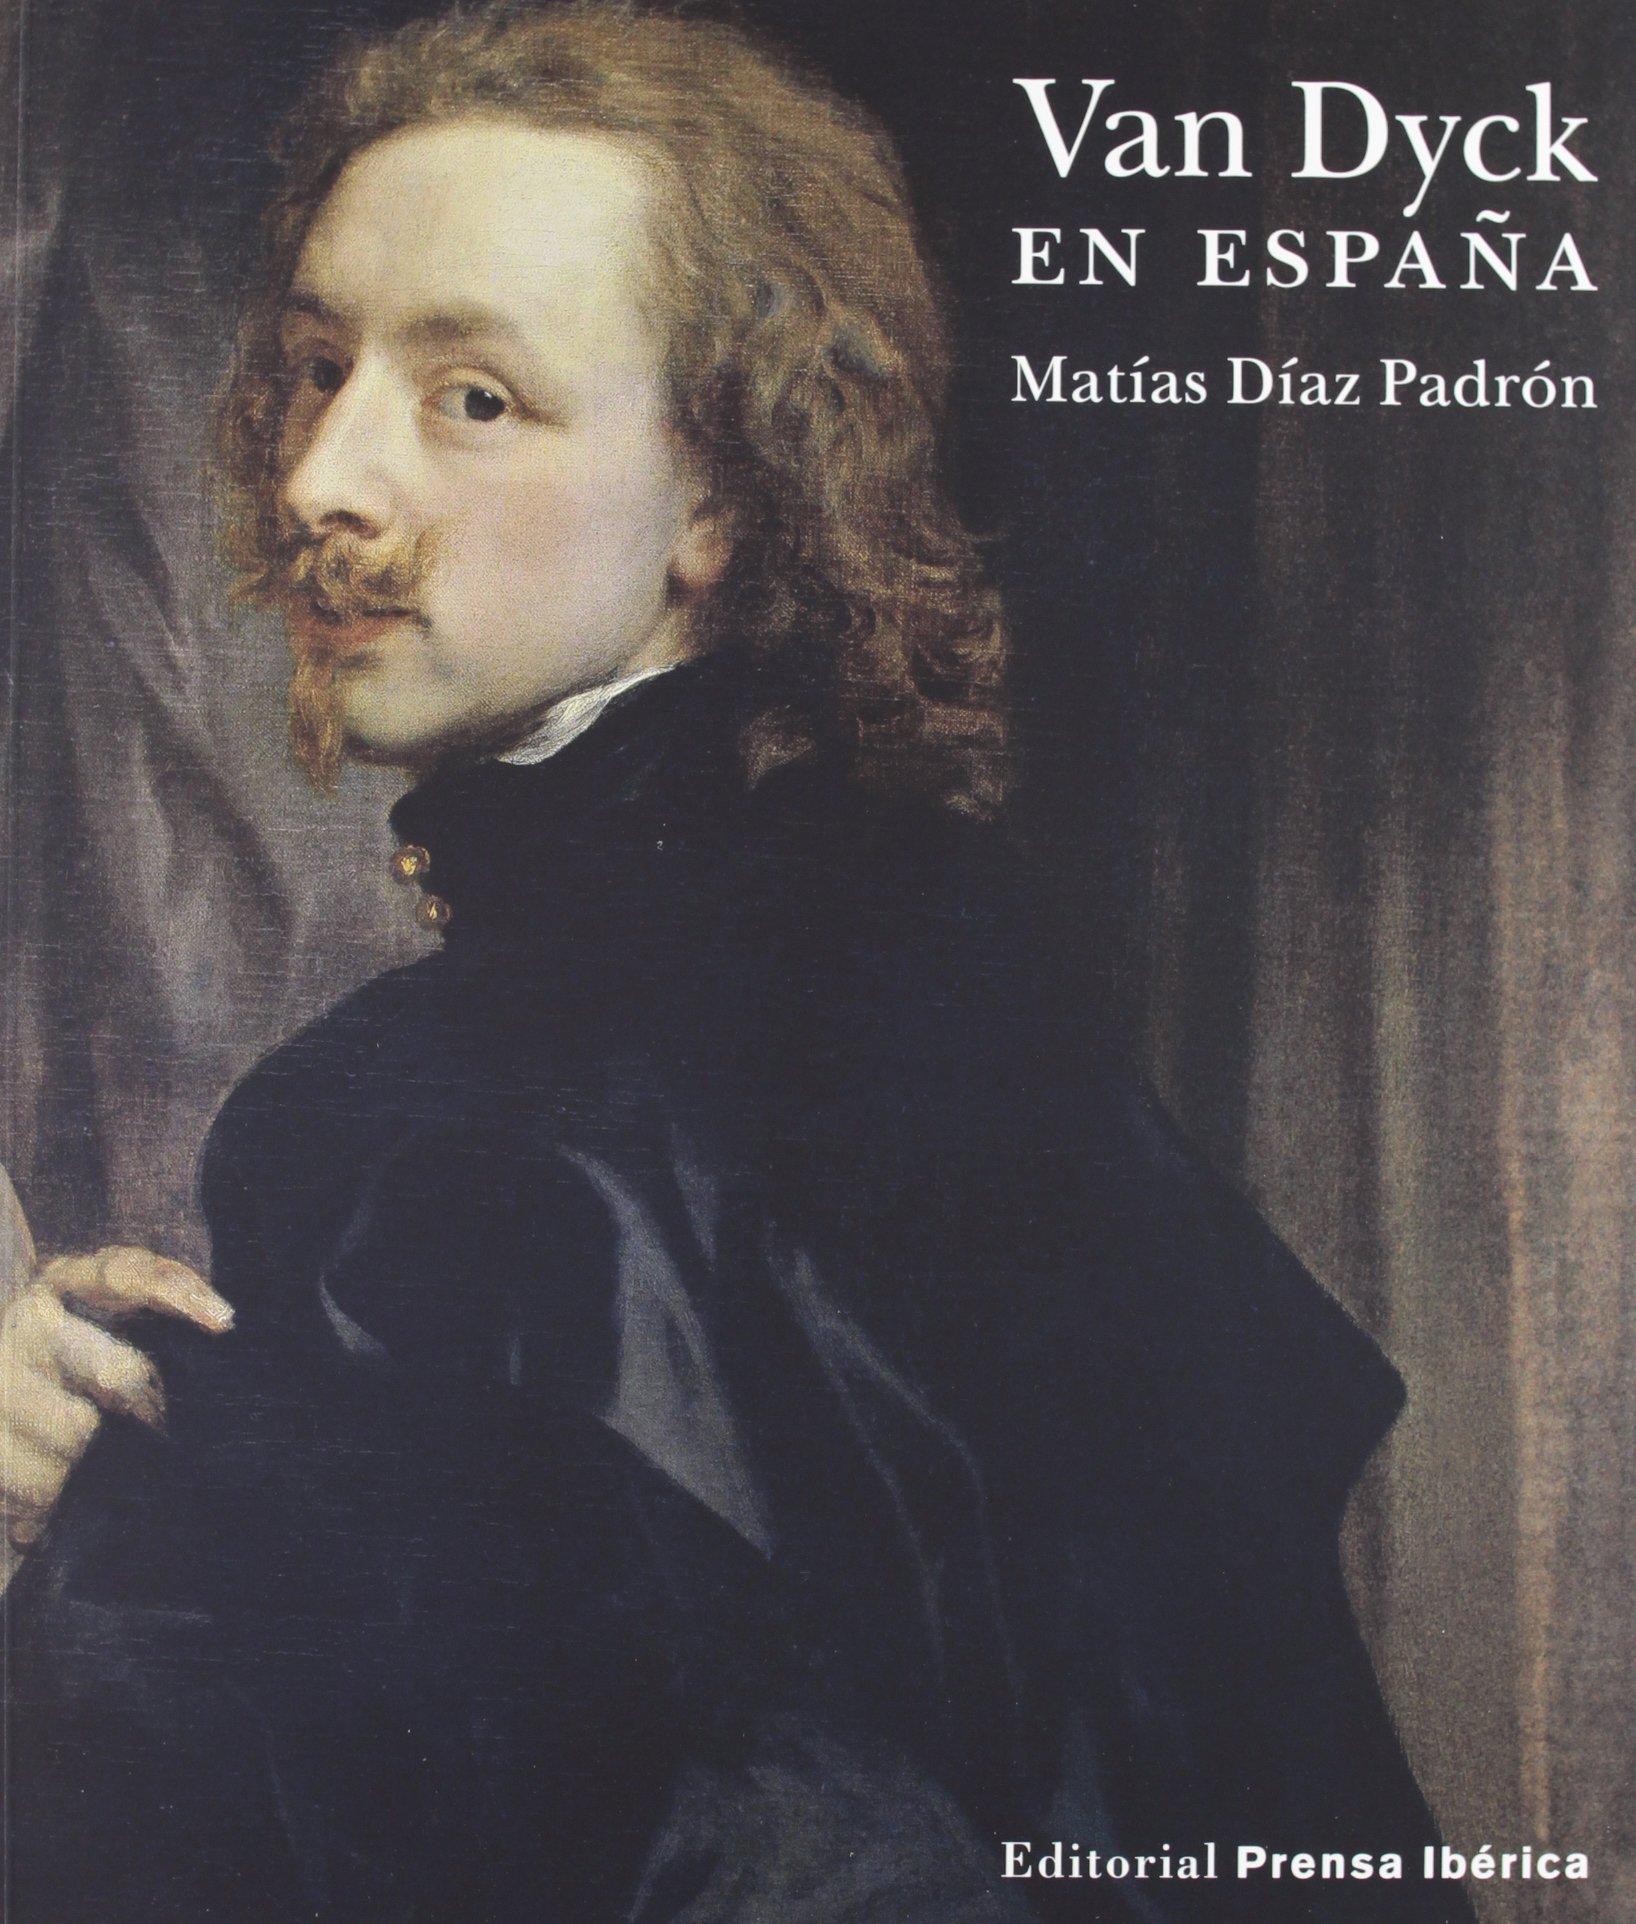 Van Dyck en España (Arte): Amazon.es: Díaz Padrón, Matías: Libros